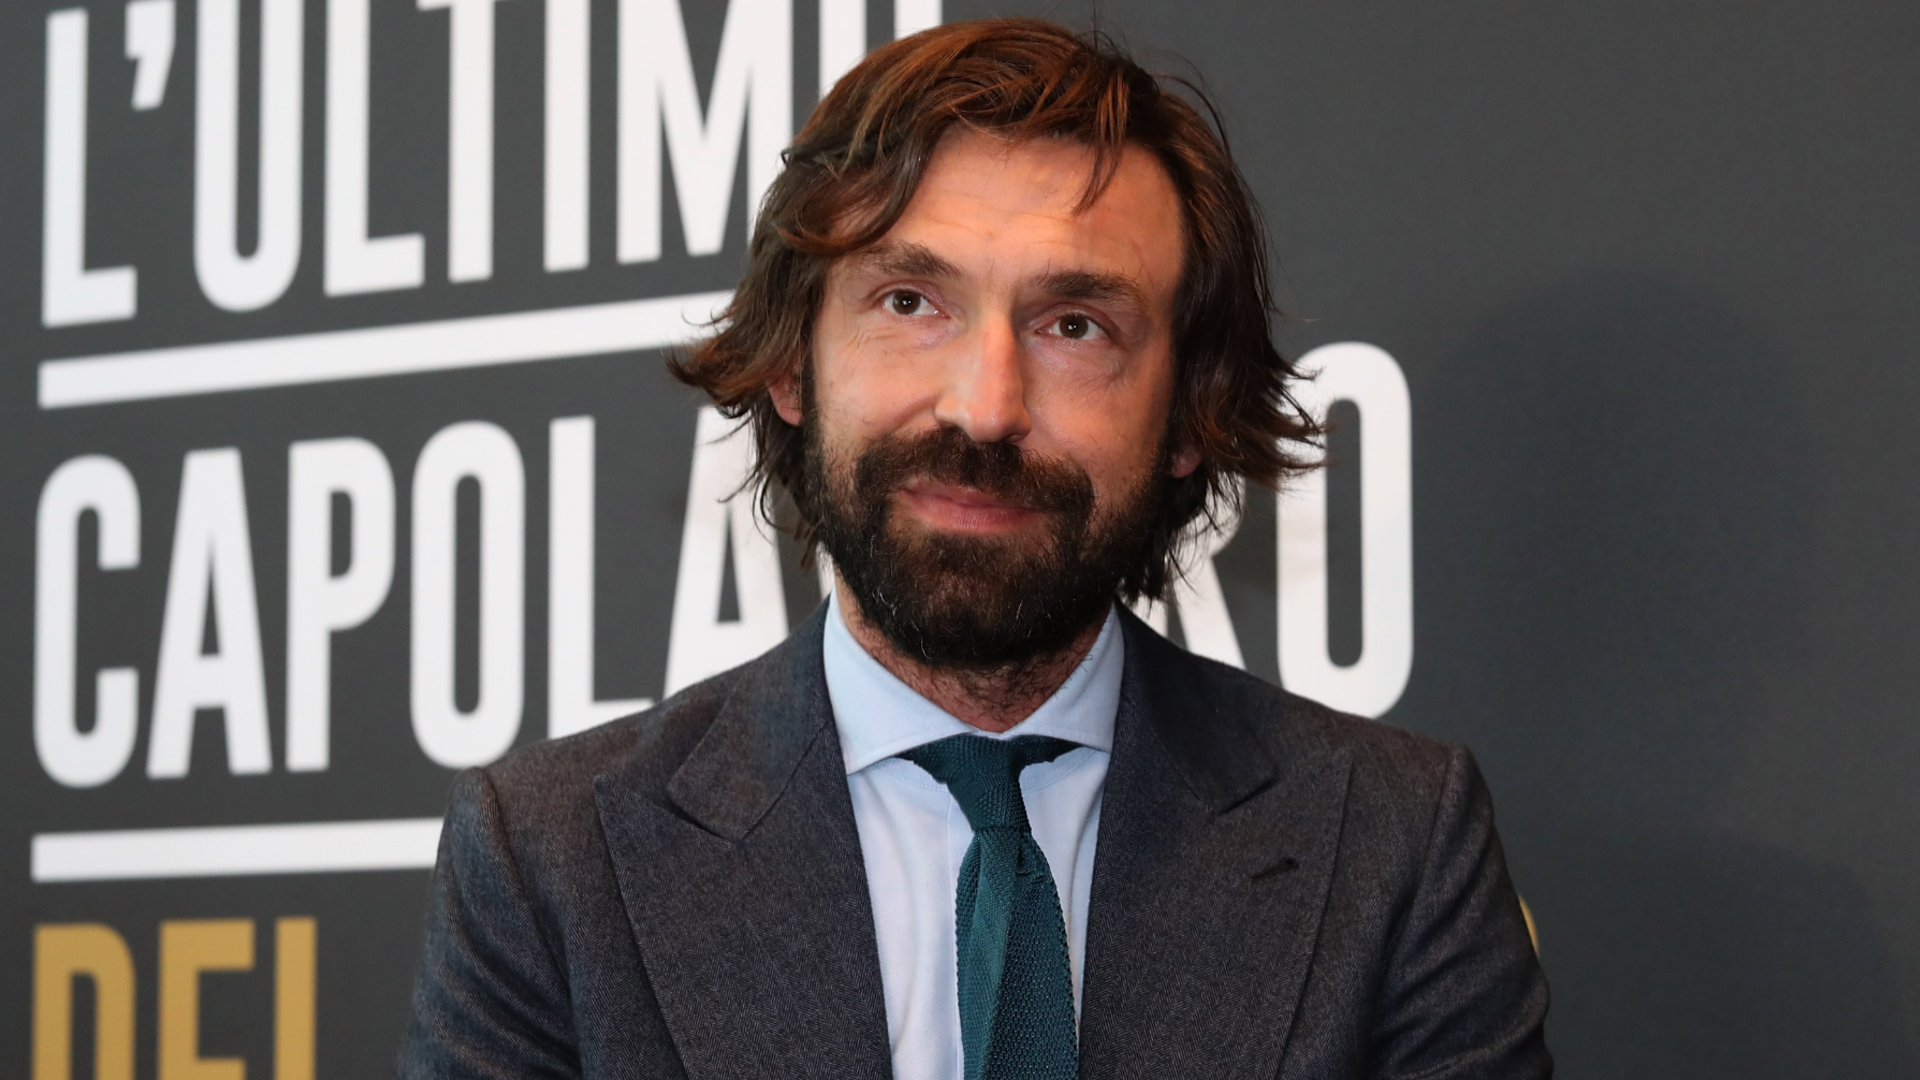 Pirlo named new Juventus head coach